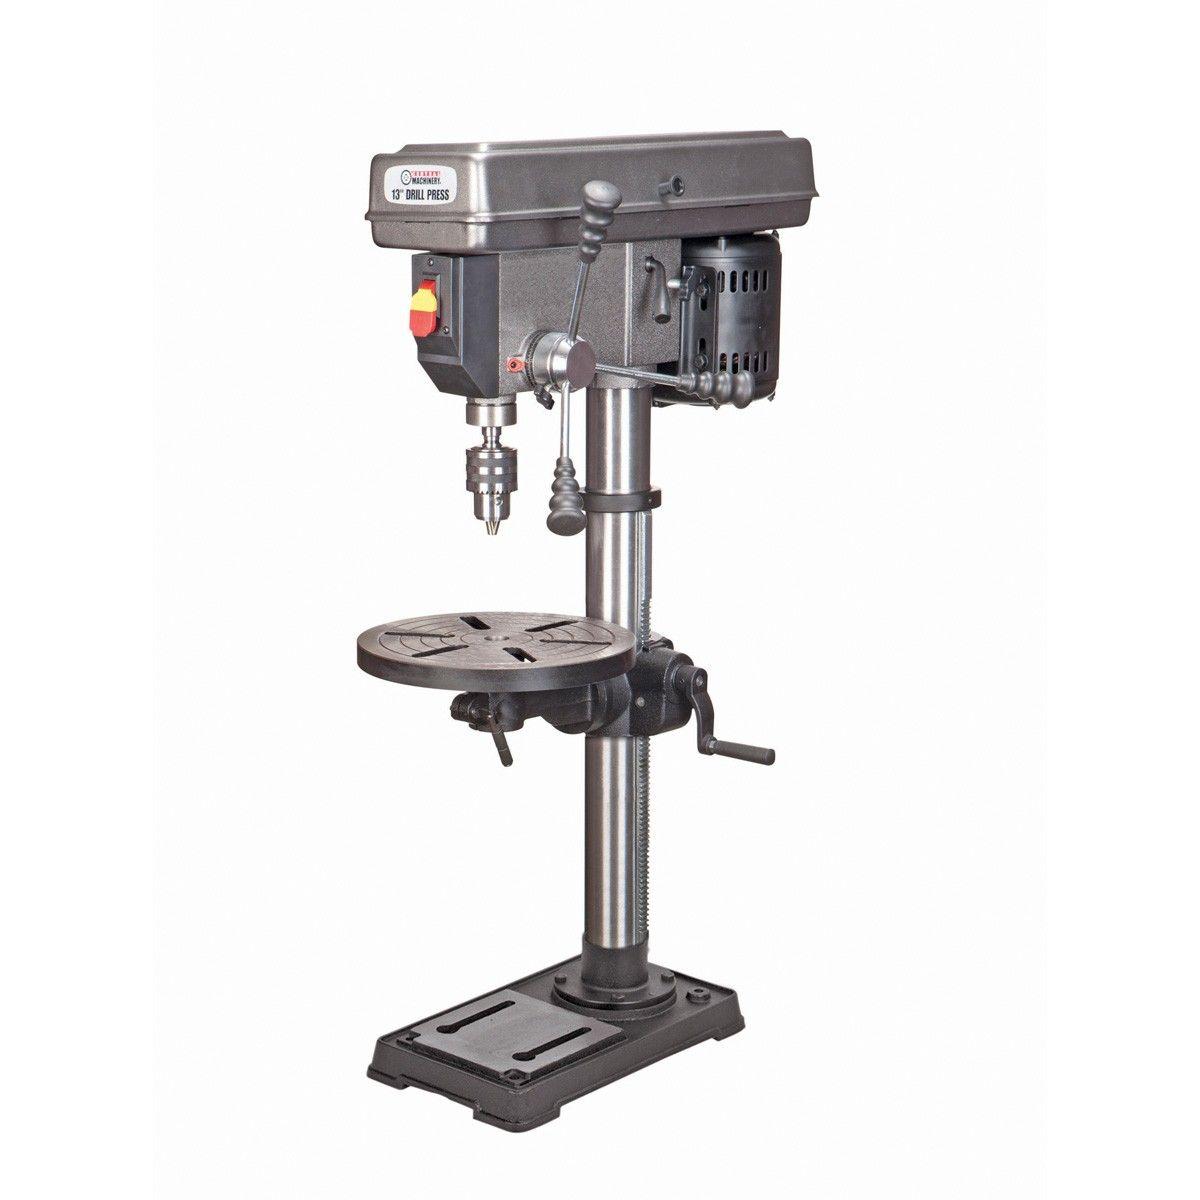 13 In 16 Speed Bench Drill Press Drill Press Tool Design Drill